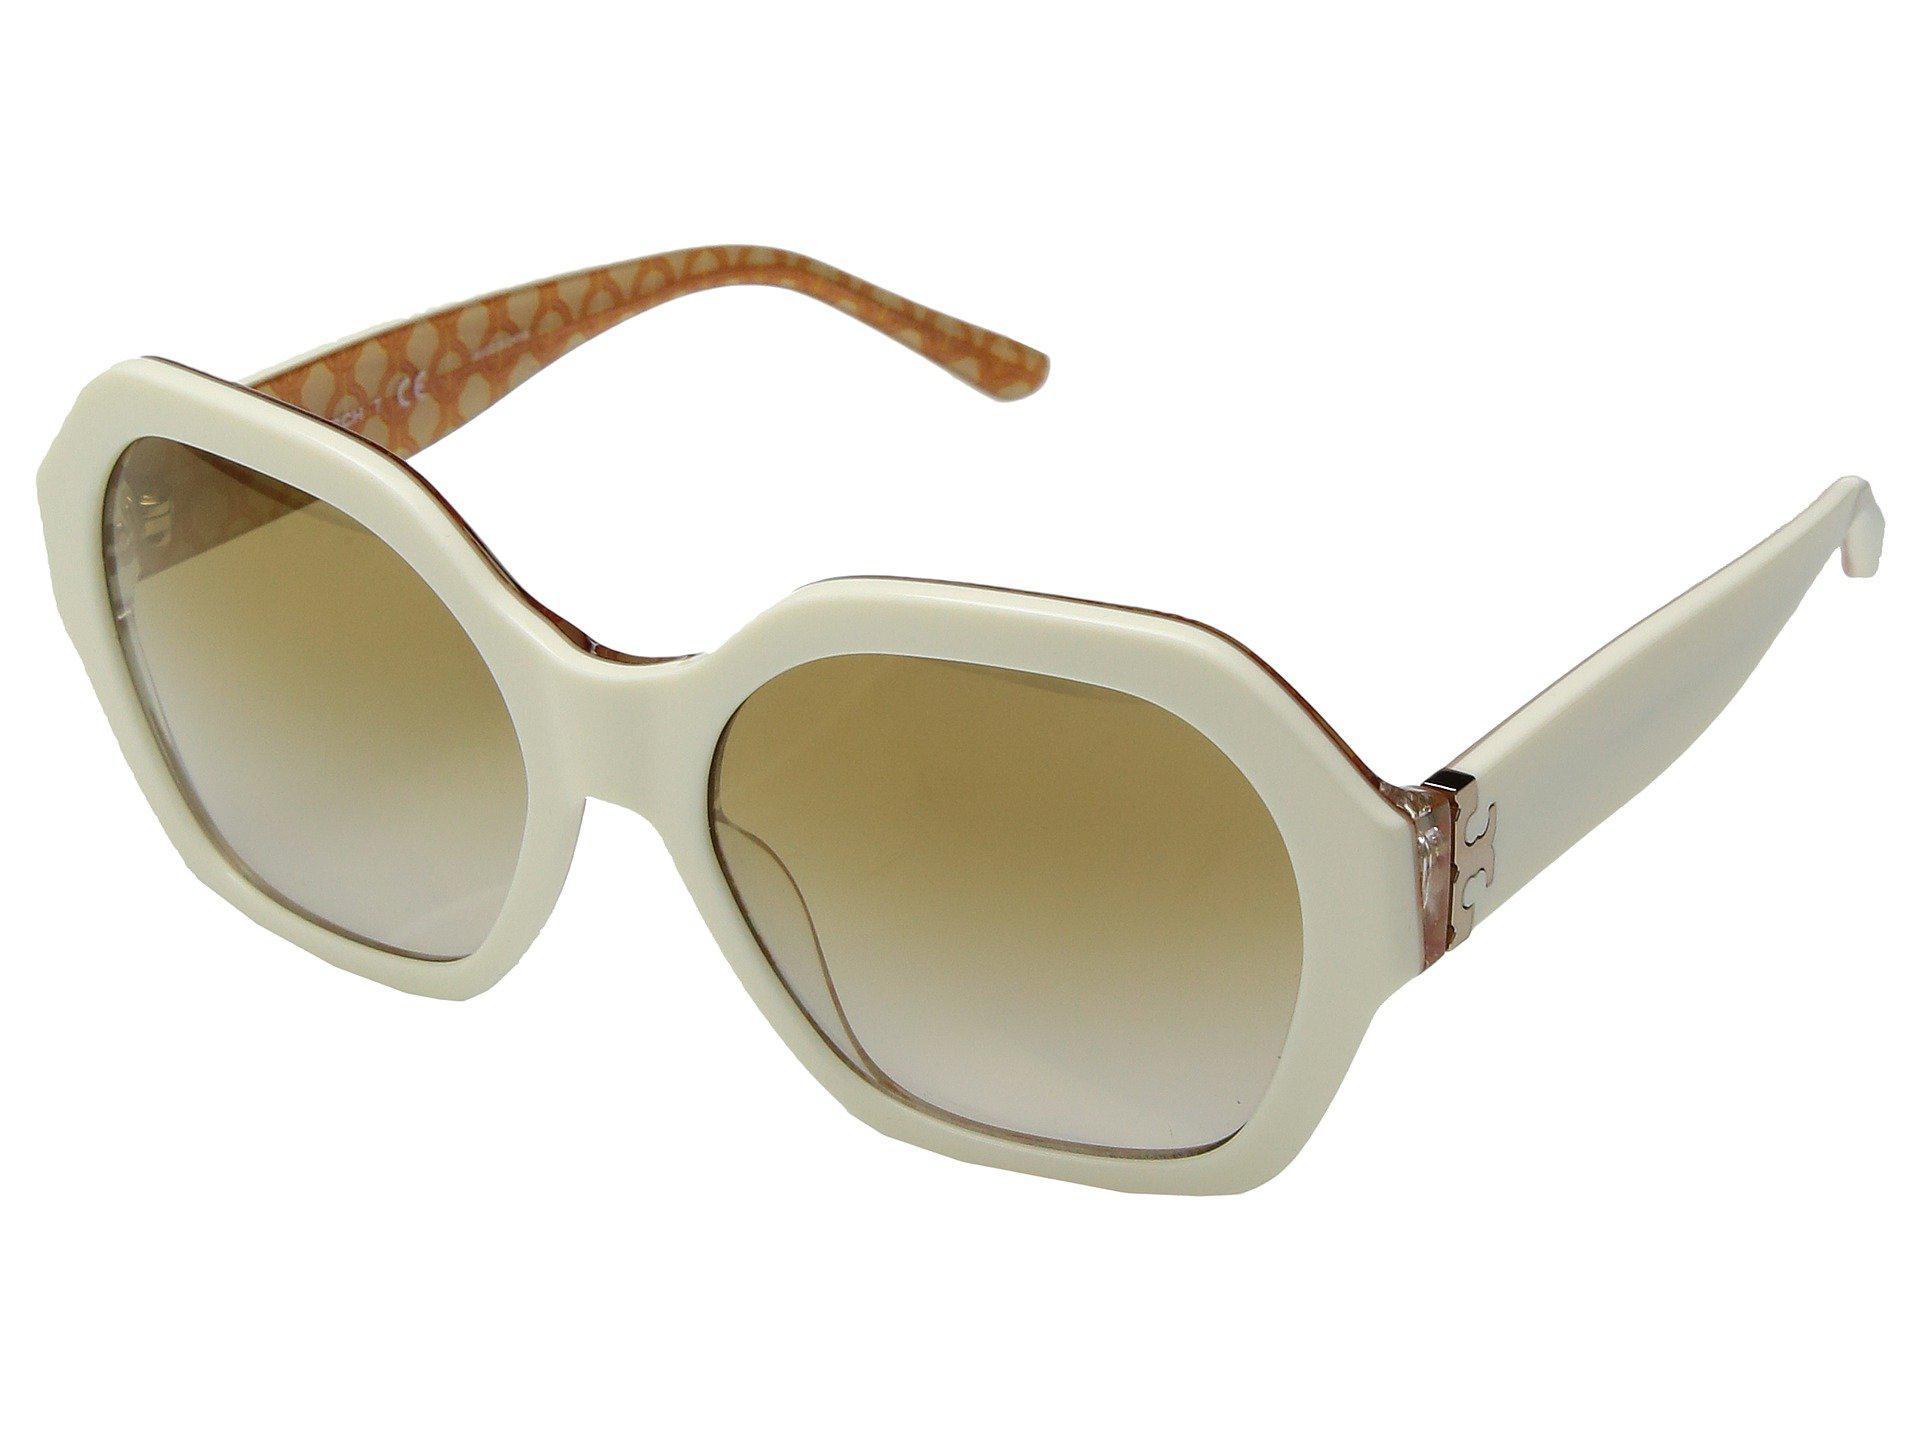 4e65f3908ddc0 Lyst - Tory Burch 0ty7120 57mm (ivory gold Gradient Mirror) Fashion ...